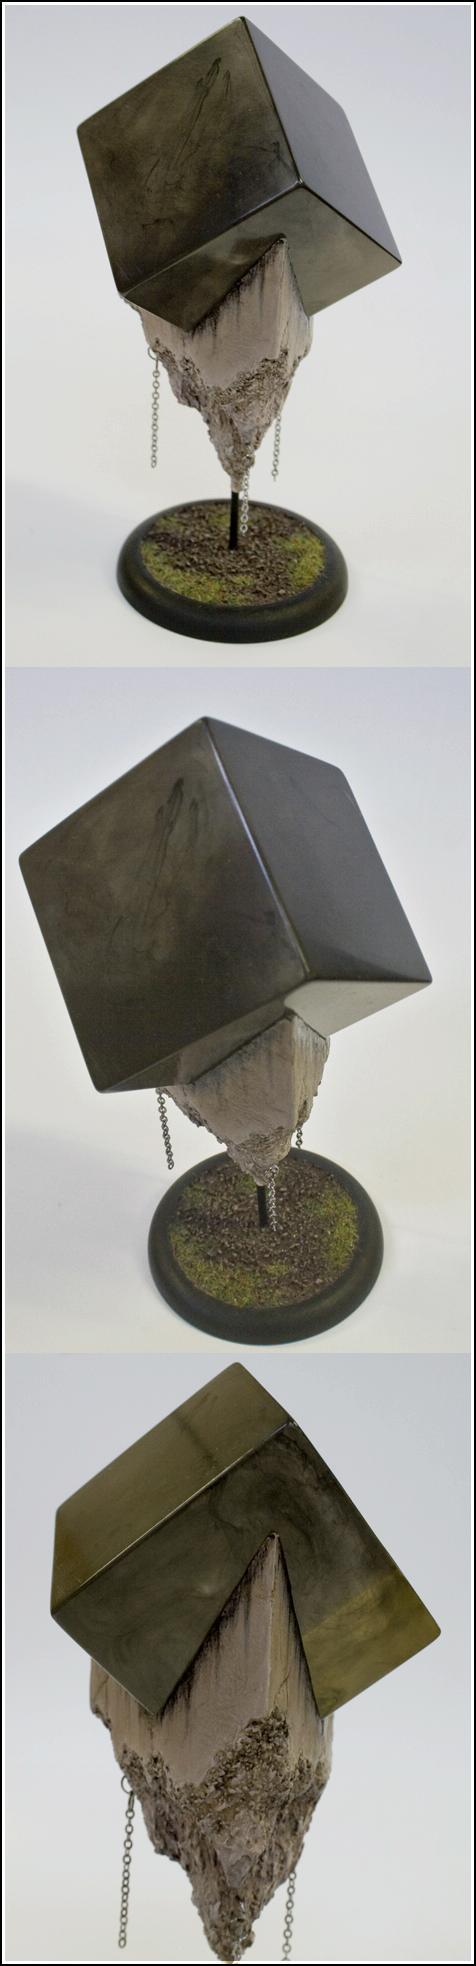 Black, Chaos, Cube, The Black Cube